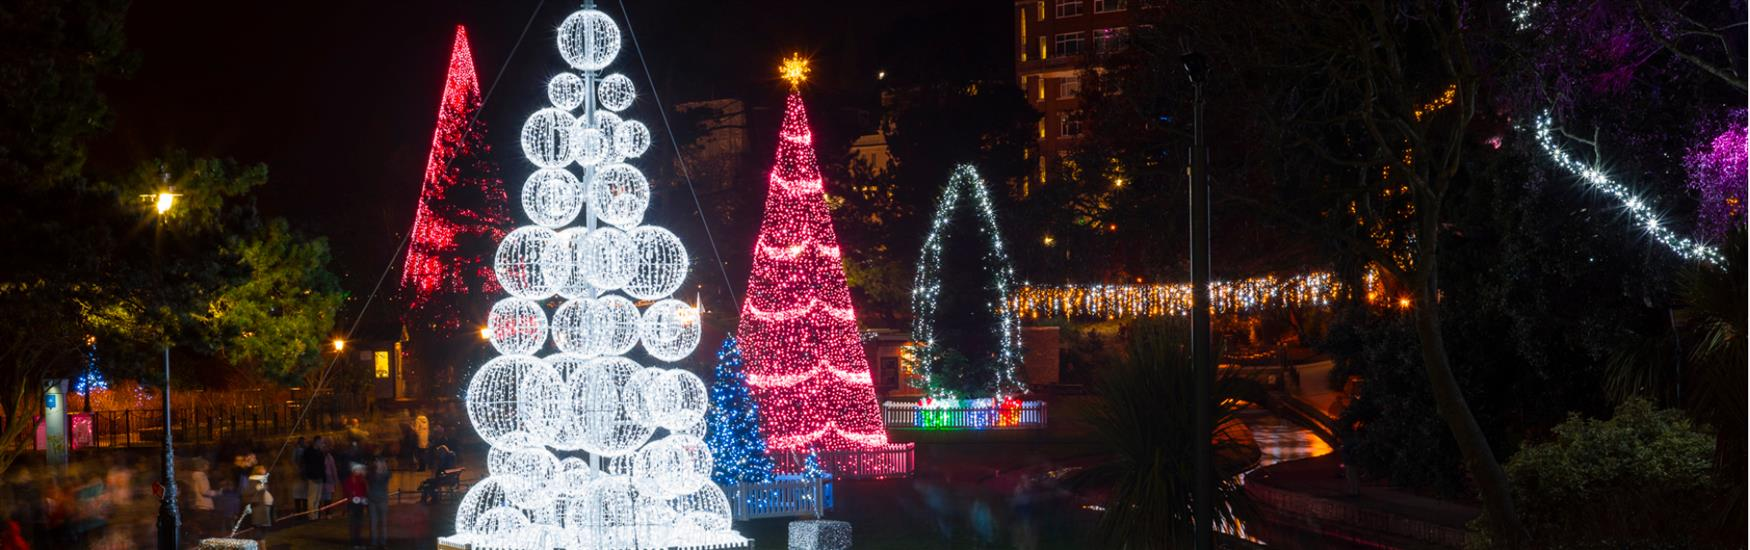 Christmas Tree Wonderland Bournemouth Coastal Bid.December Events Bournemouth